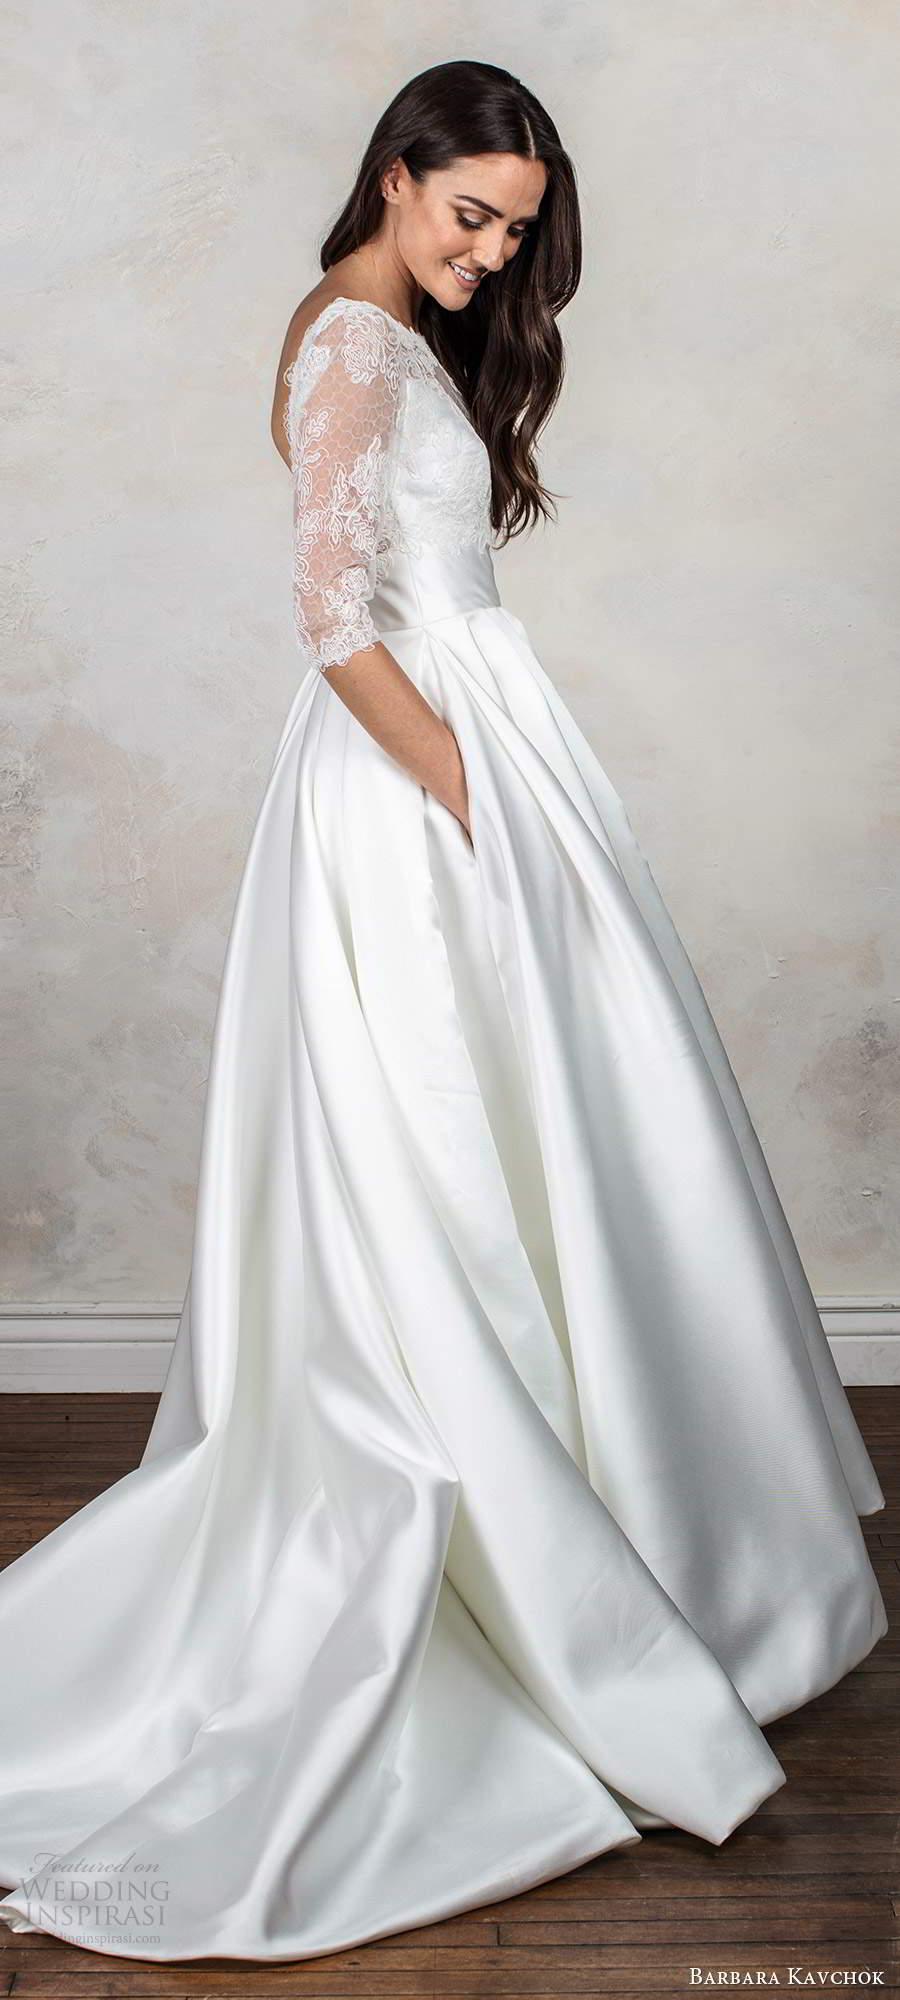 barbara kavchok fall 2020 bridal illusion 3 quarter sleeves bateau neck sweetheart neckline clean slit skirt a line ball gown wedding dress chapel train (11) sv